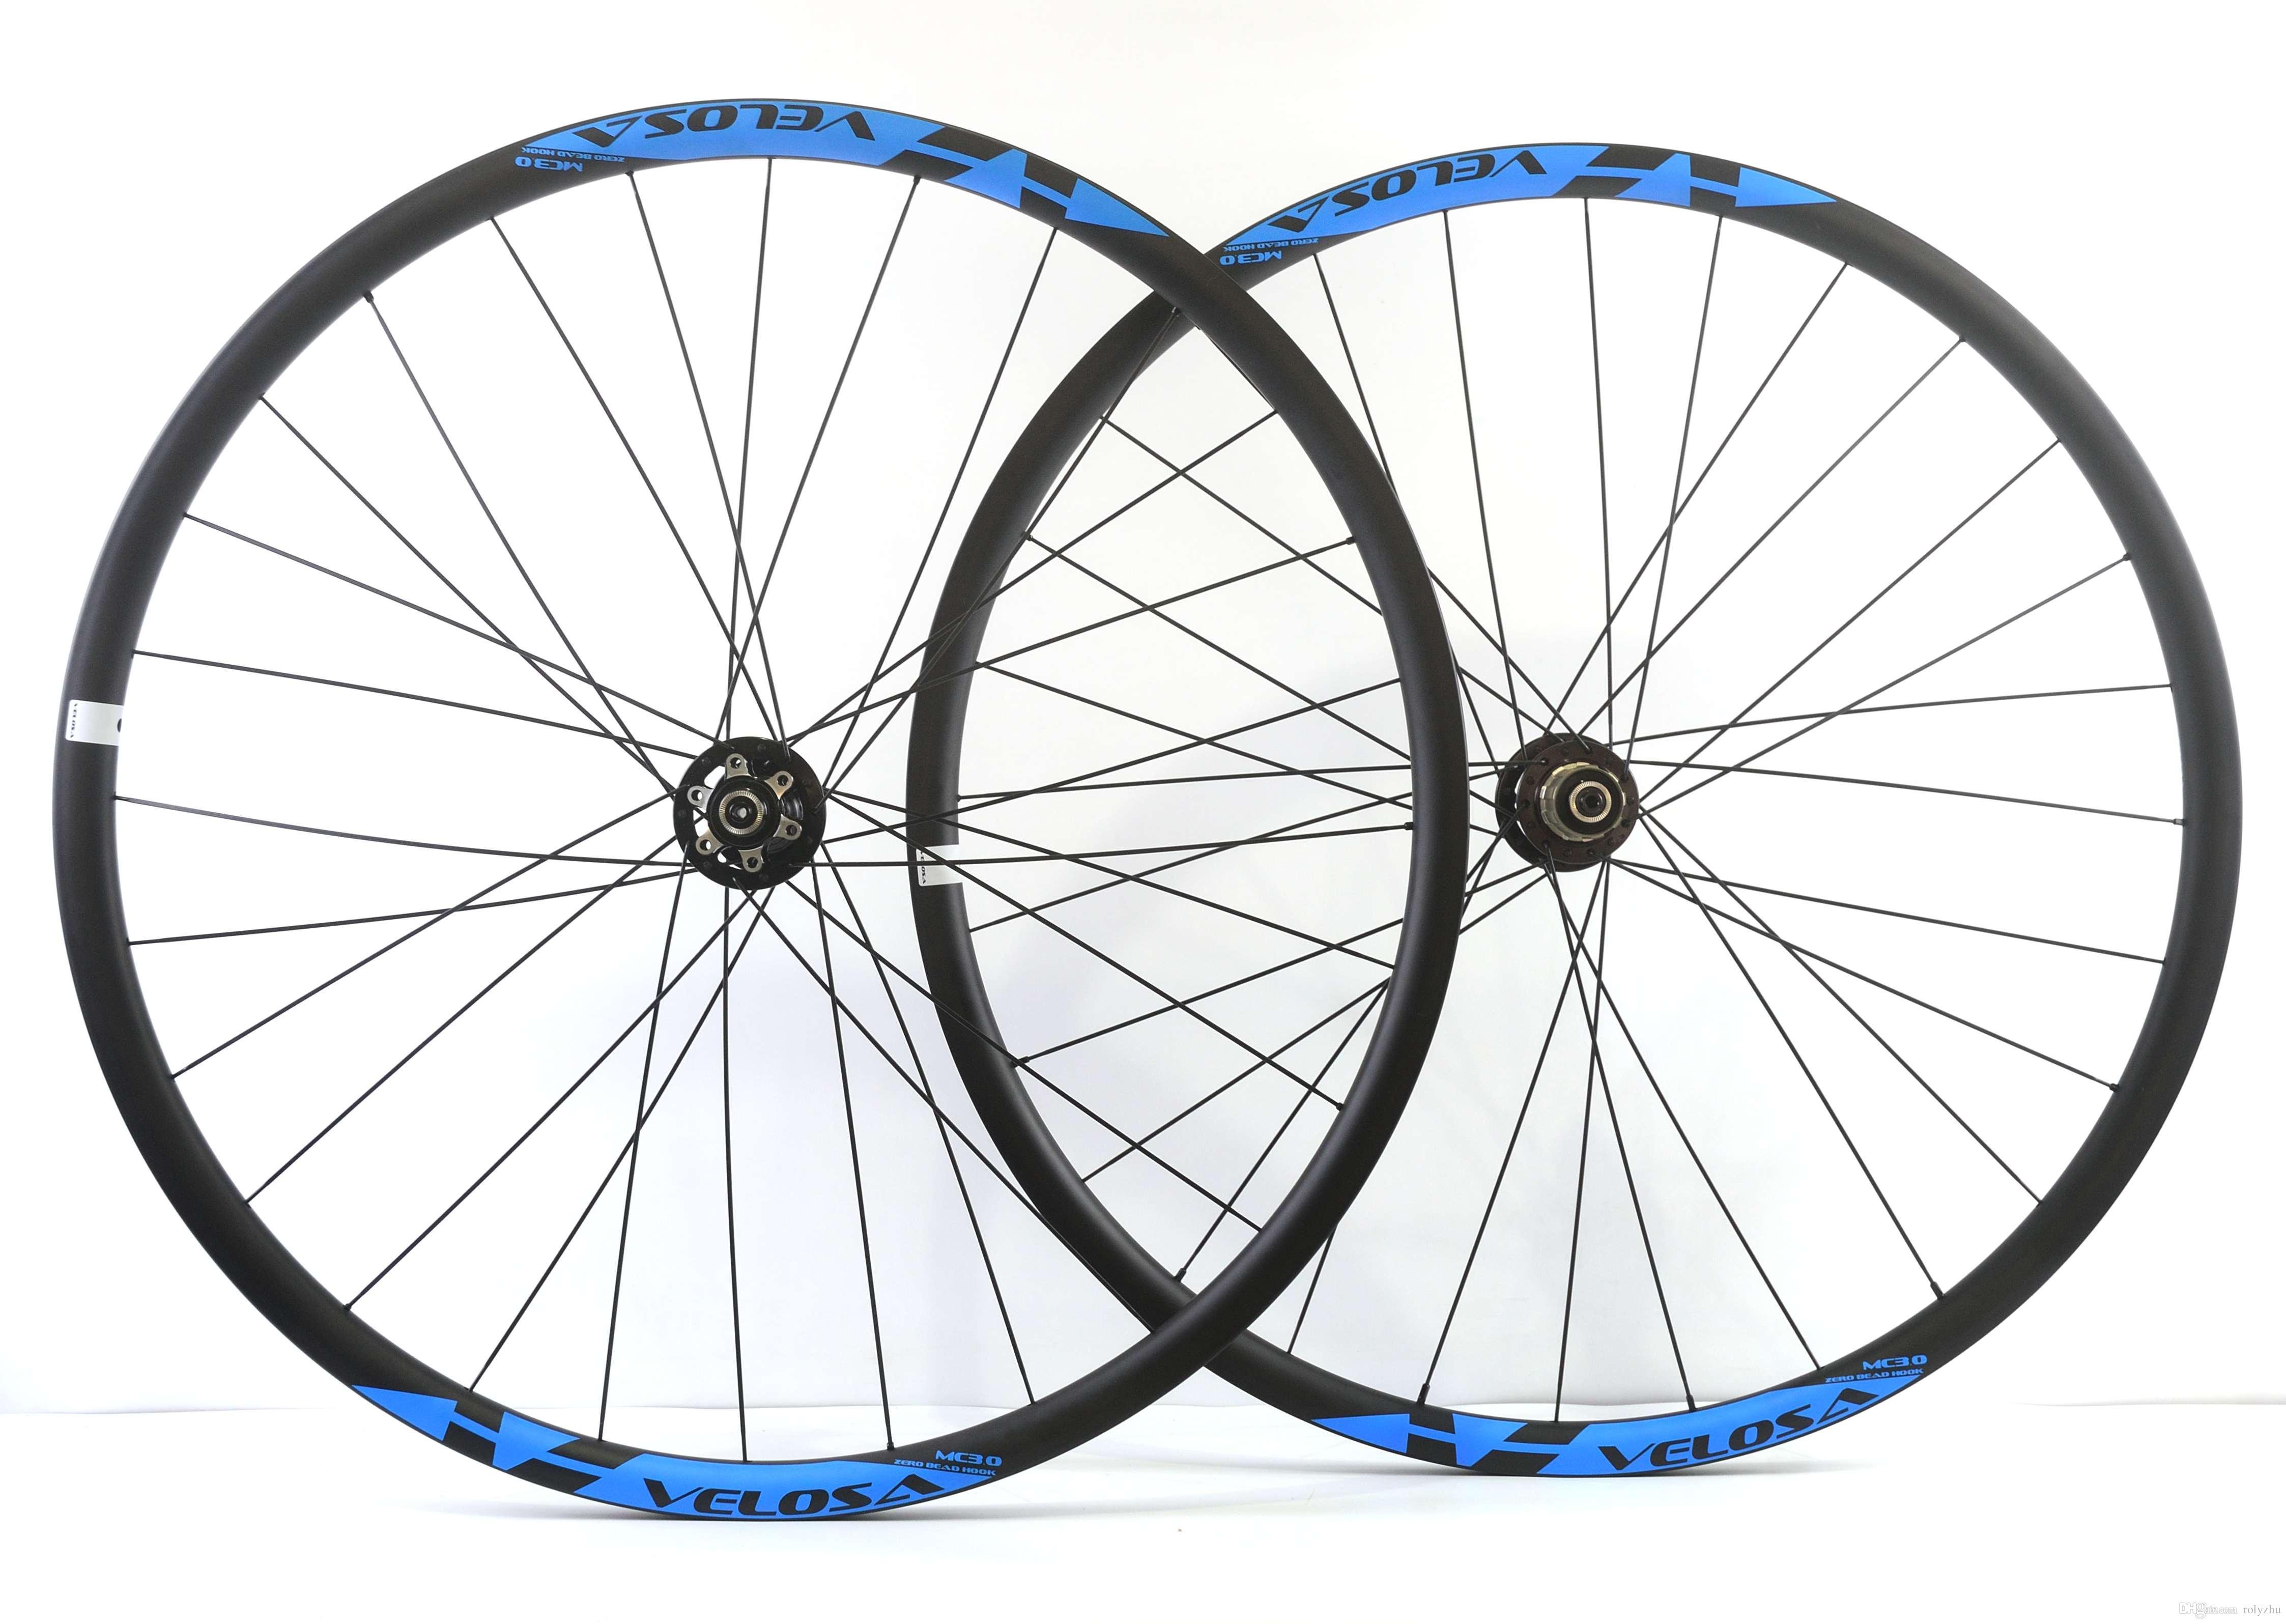 Velosa Carbon Wheels Hookless 29er Mountain Bike Wheels 29inch Mtb